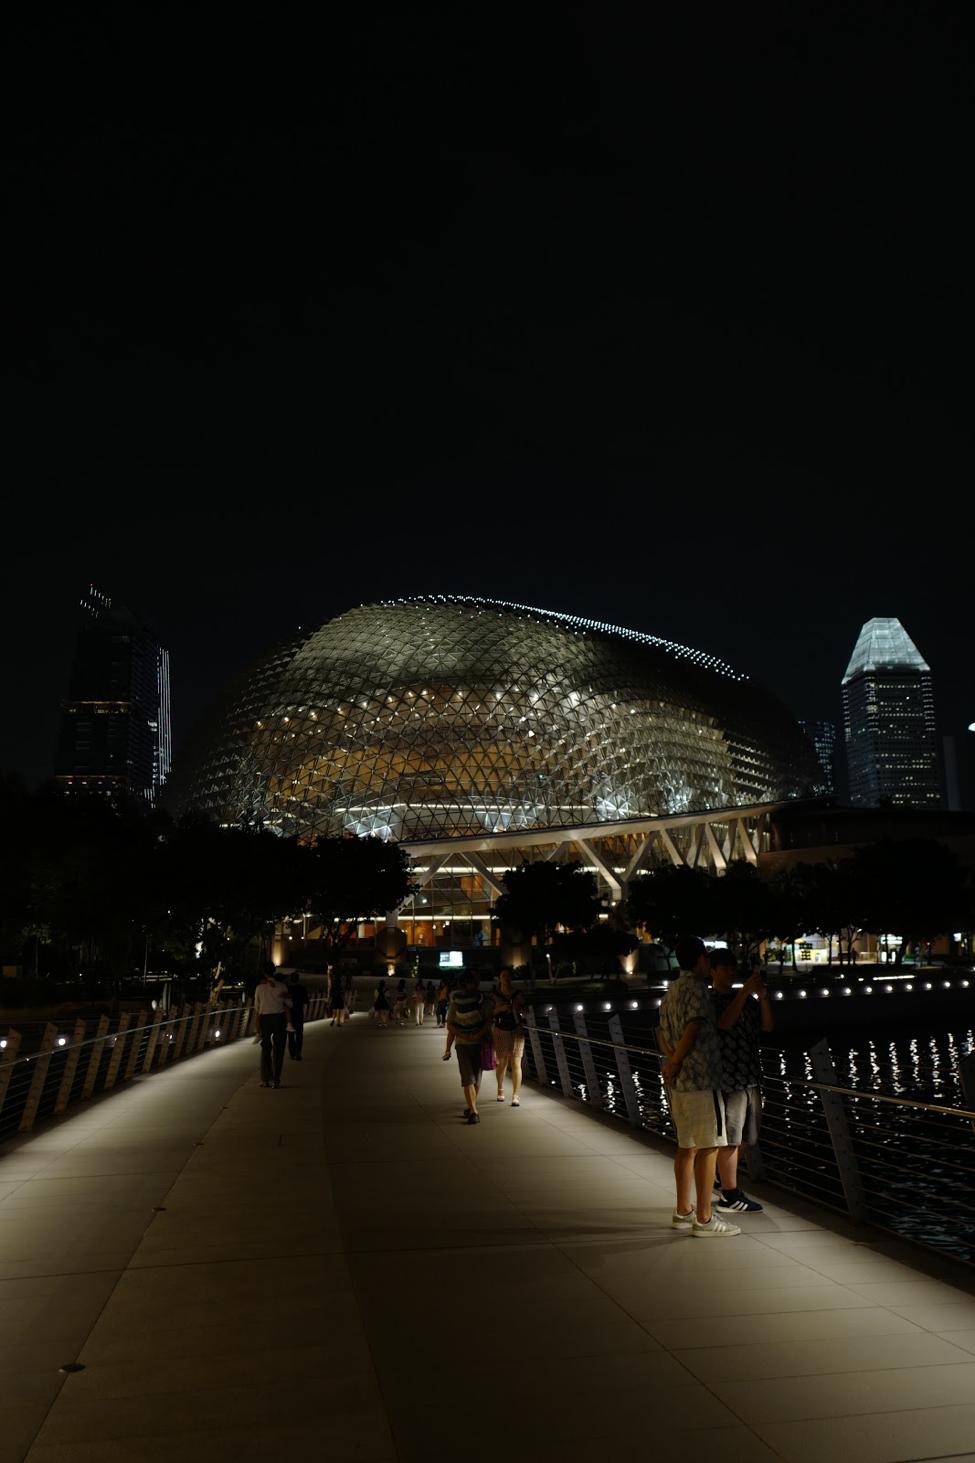 Views of the    Esplanade Theatre    from the Jubilee Bridge